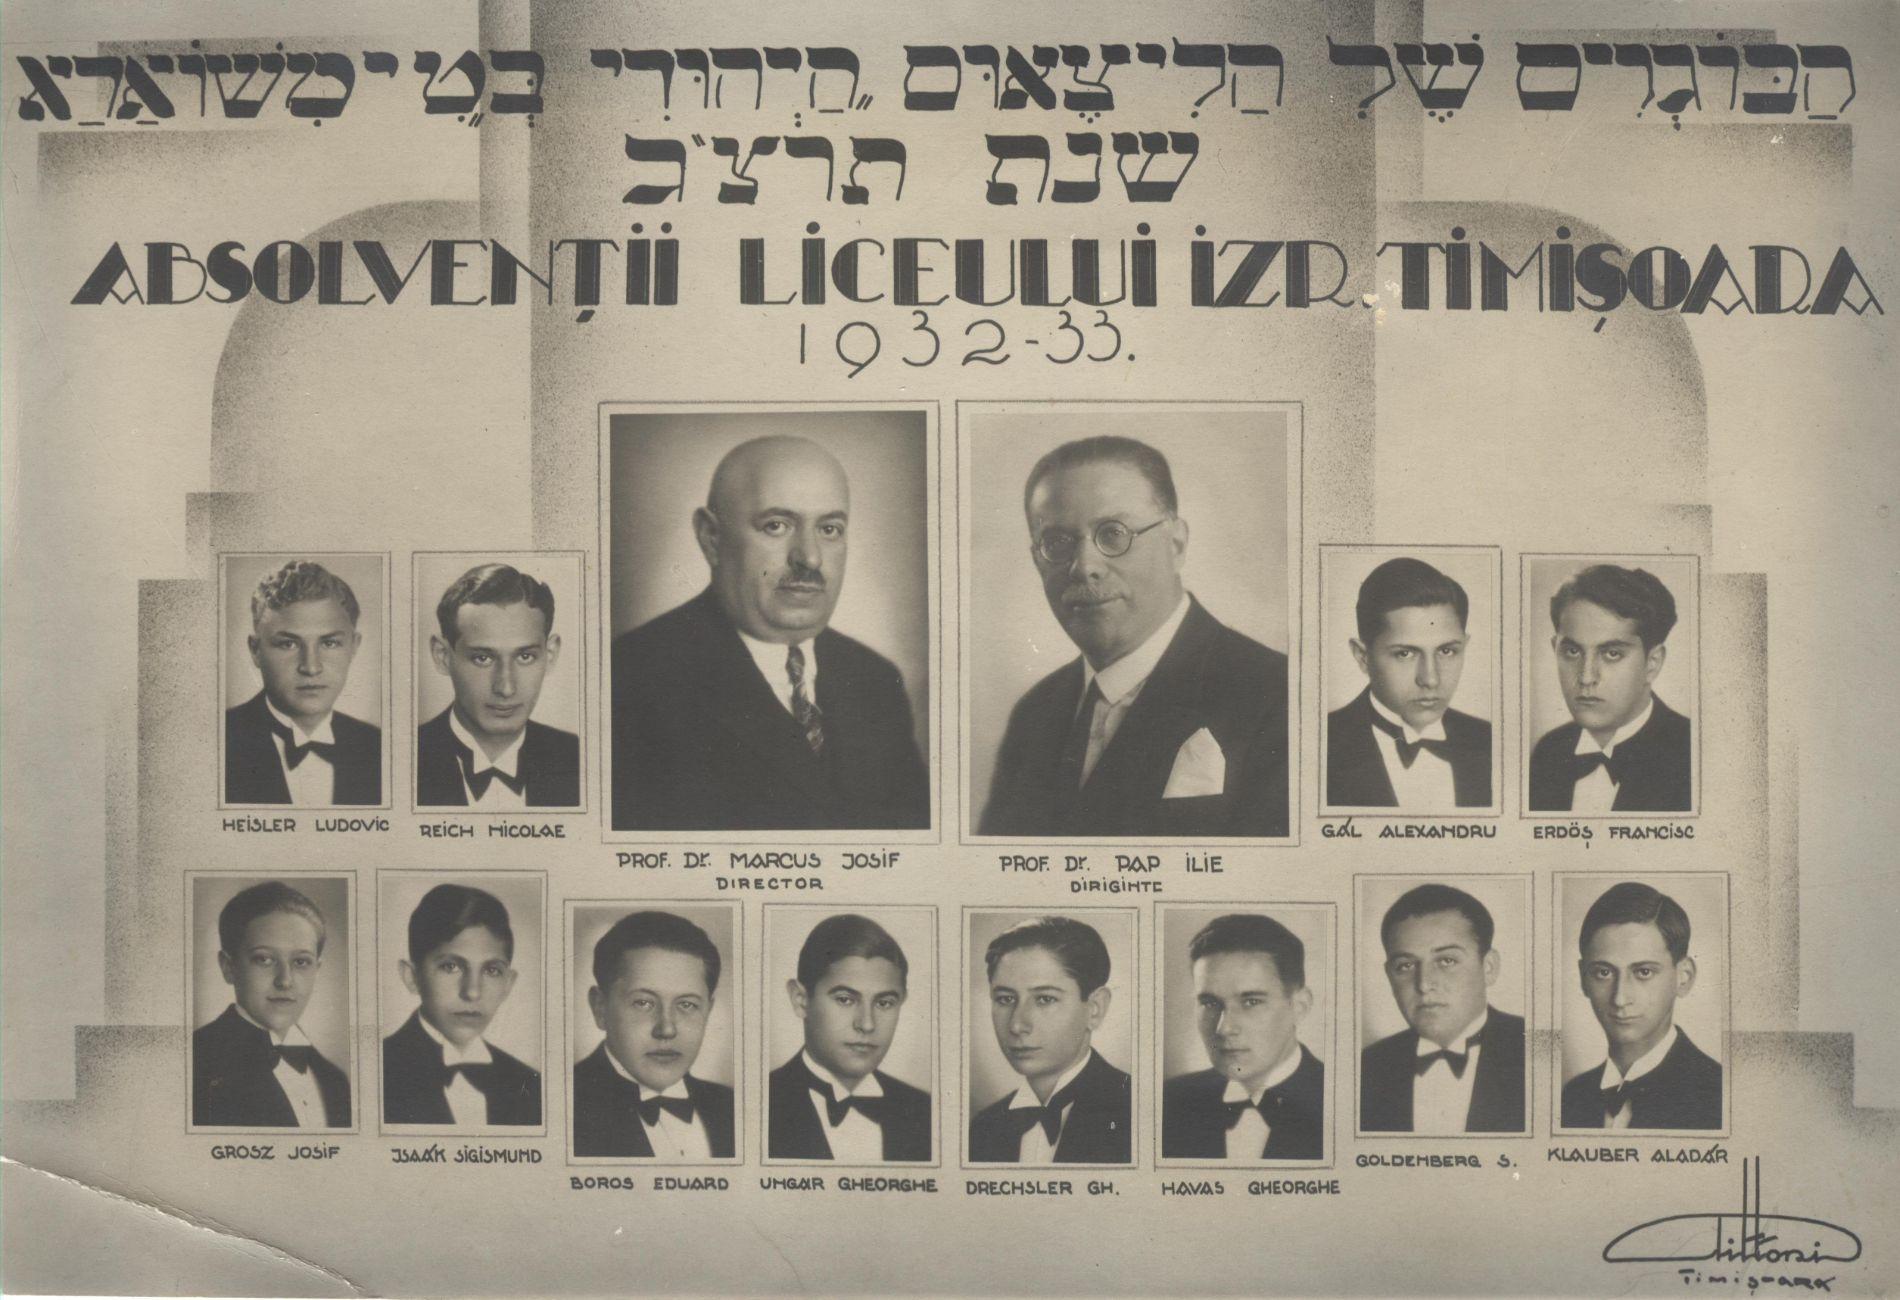 1932-1933